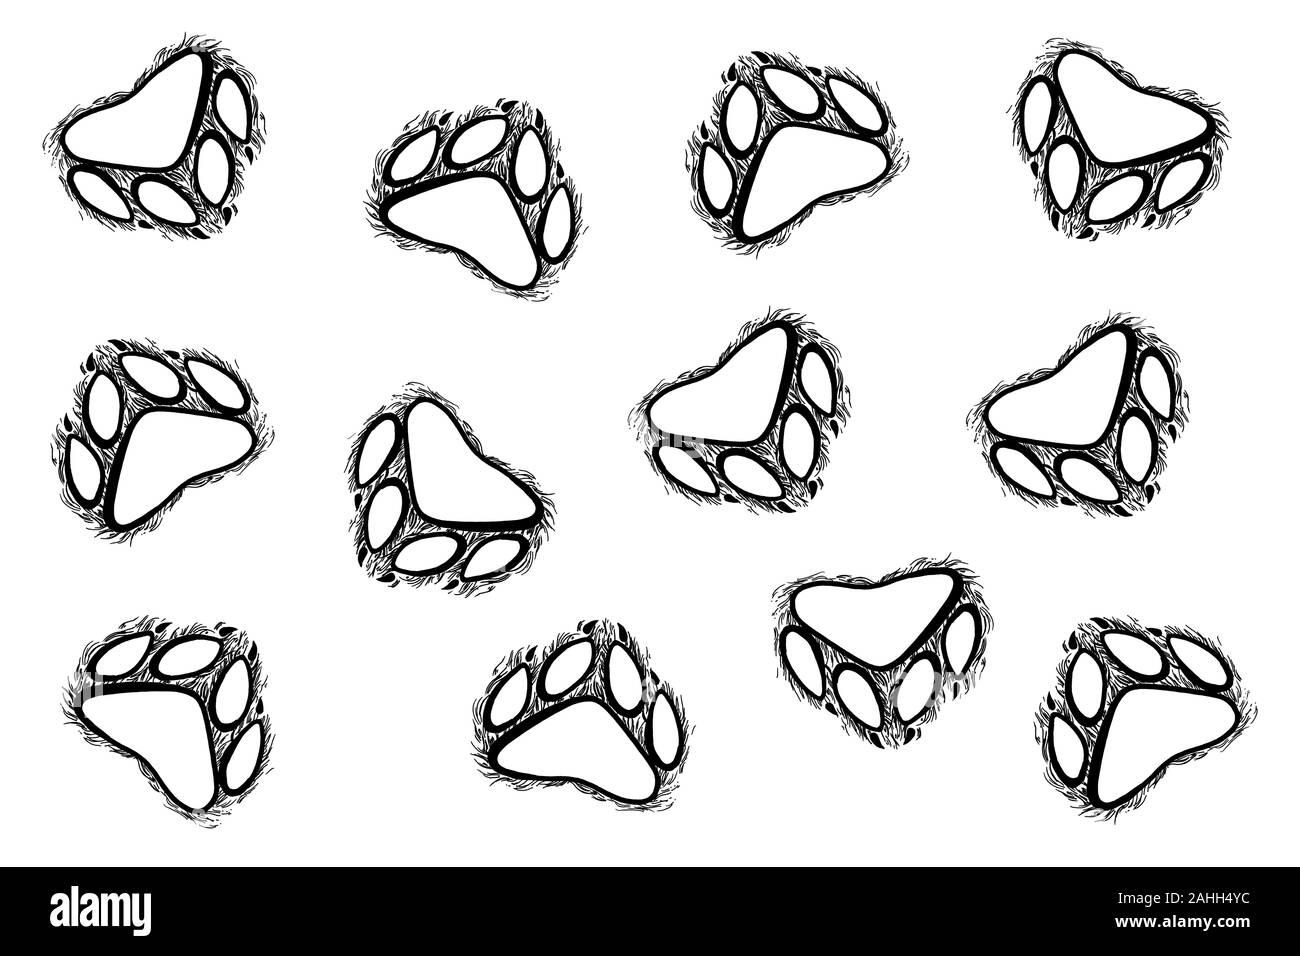 Hand drawn animal footprints, sketch graphics monochrome illustration on white background (originals, no tracing) Stock Photo